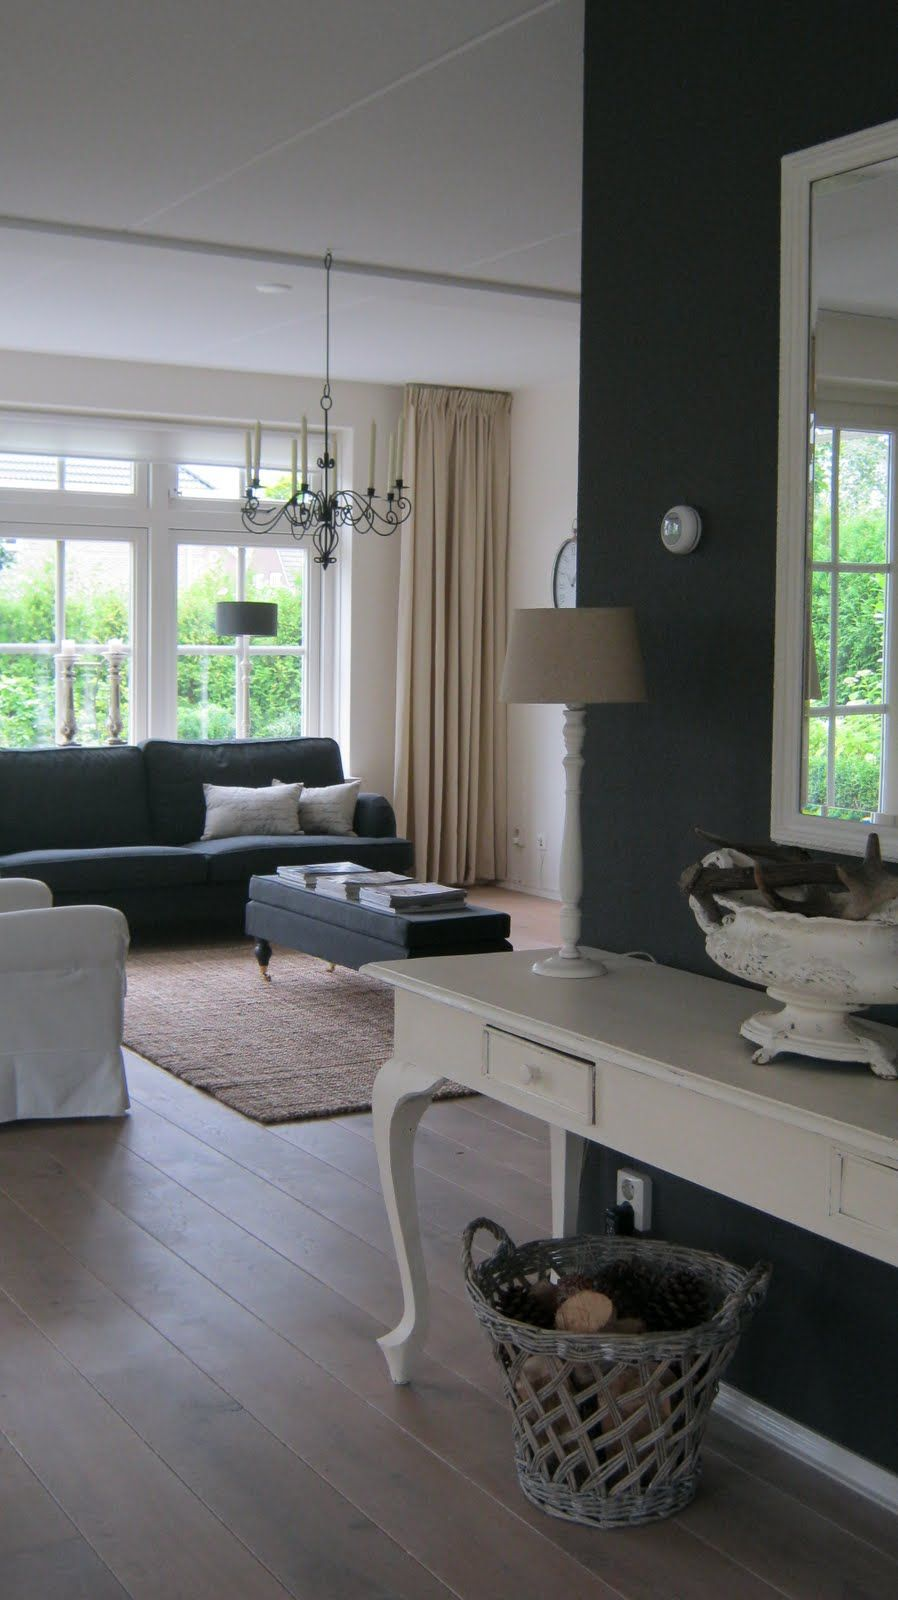 Woonkamer - new place wishes | Pinterest - Crème, Gordijnen en Grijs